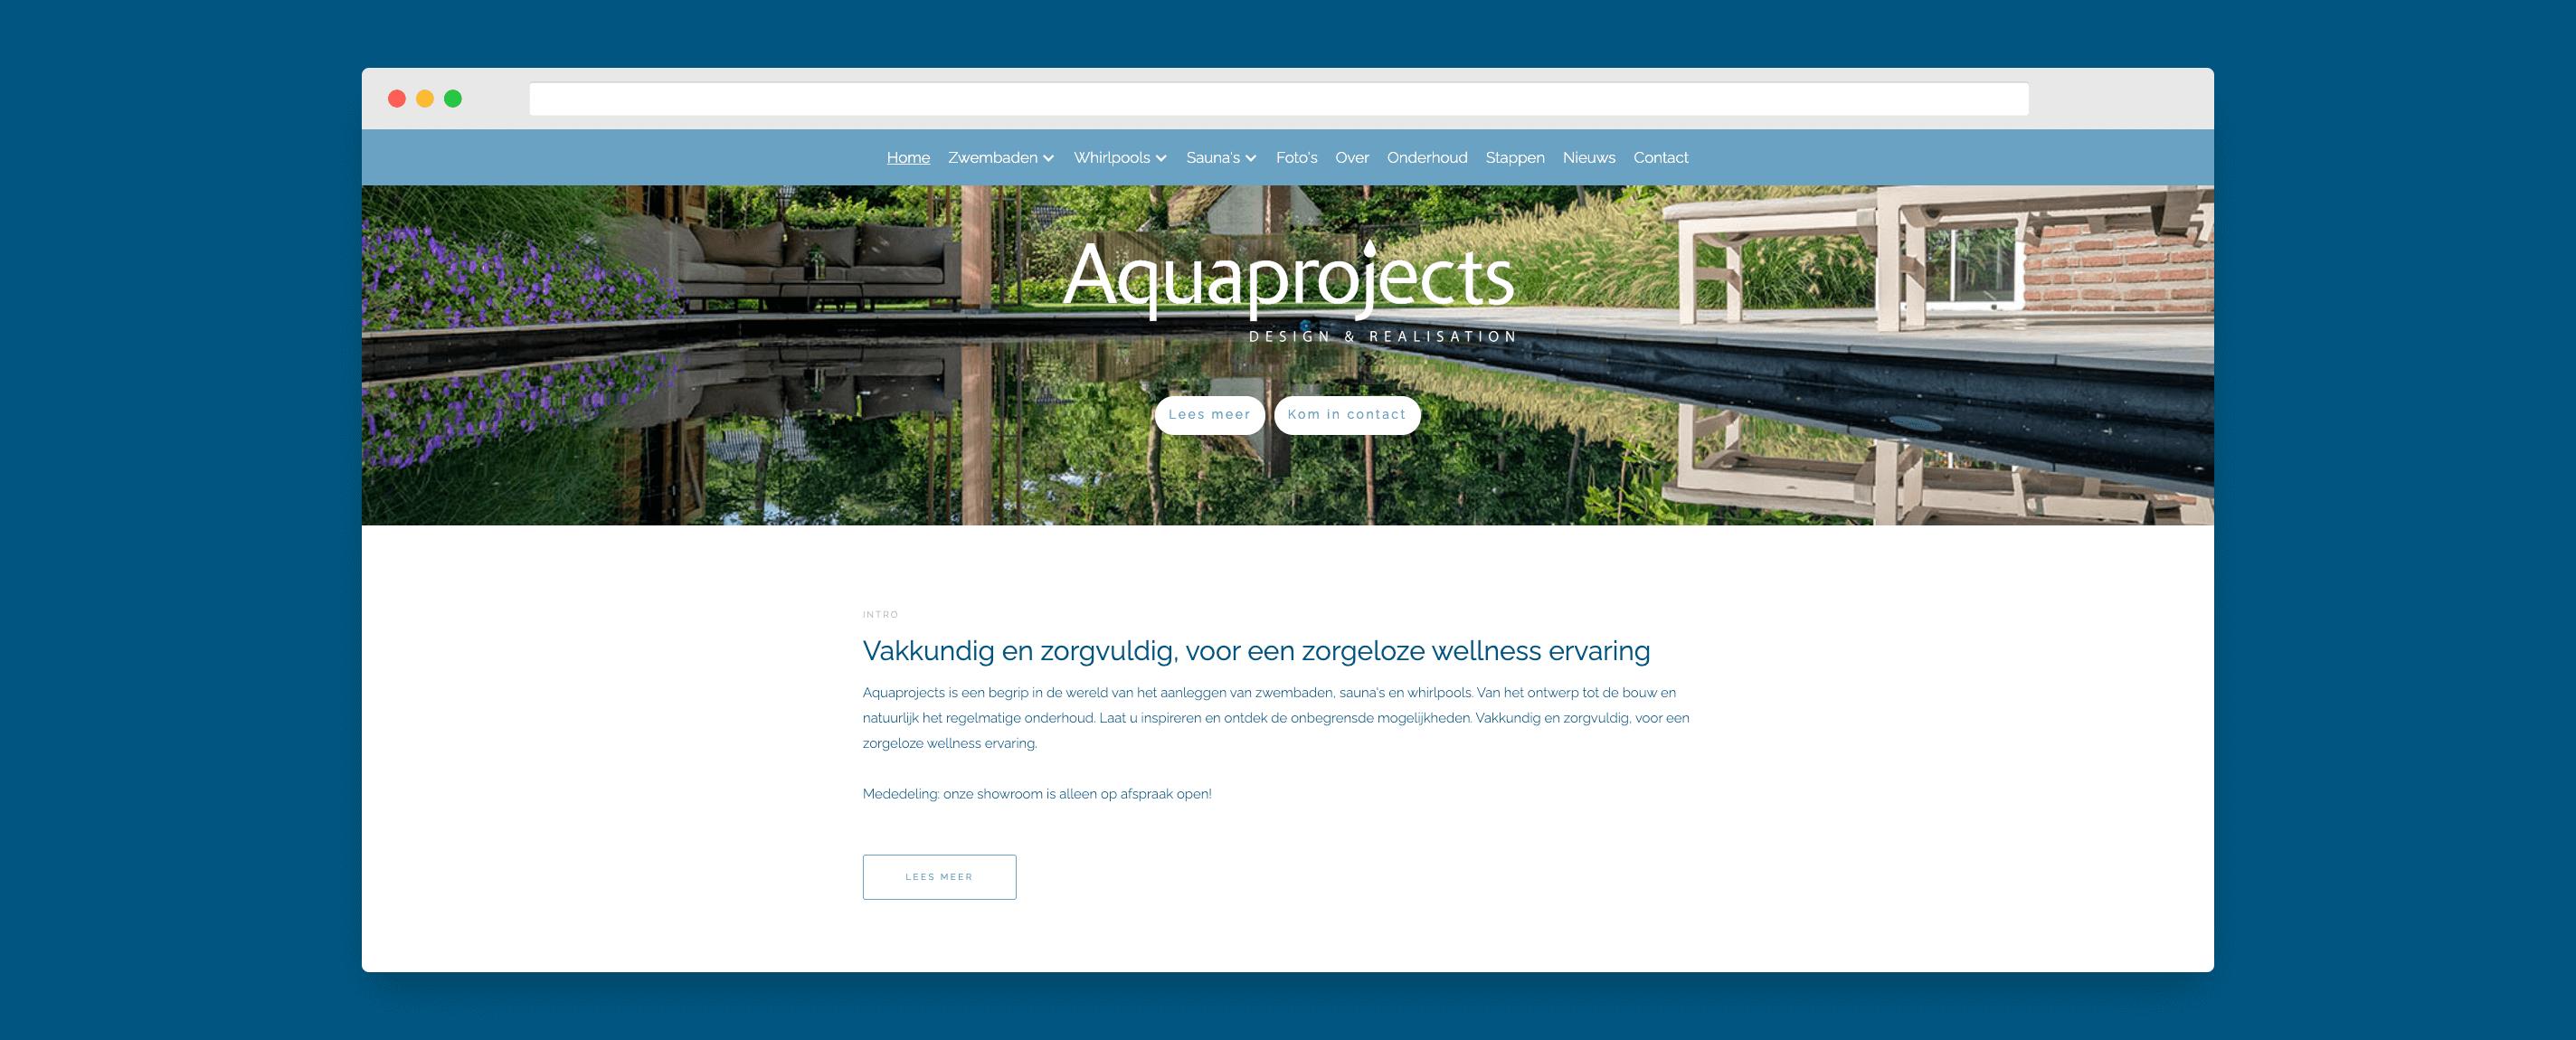 Aquaprojects